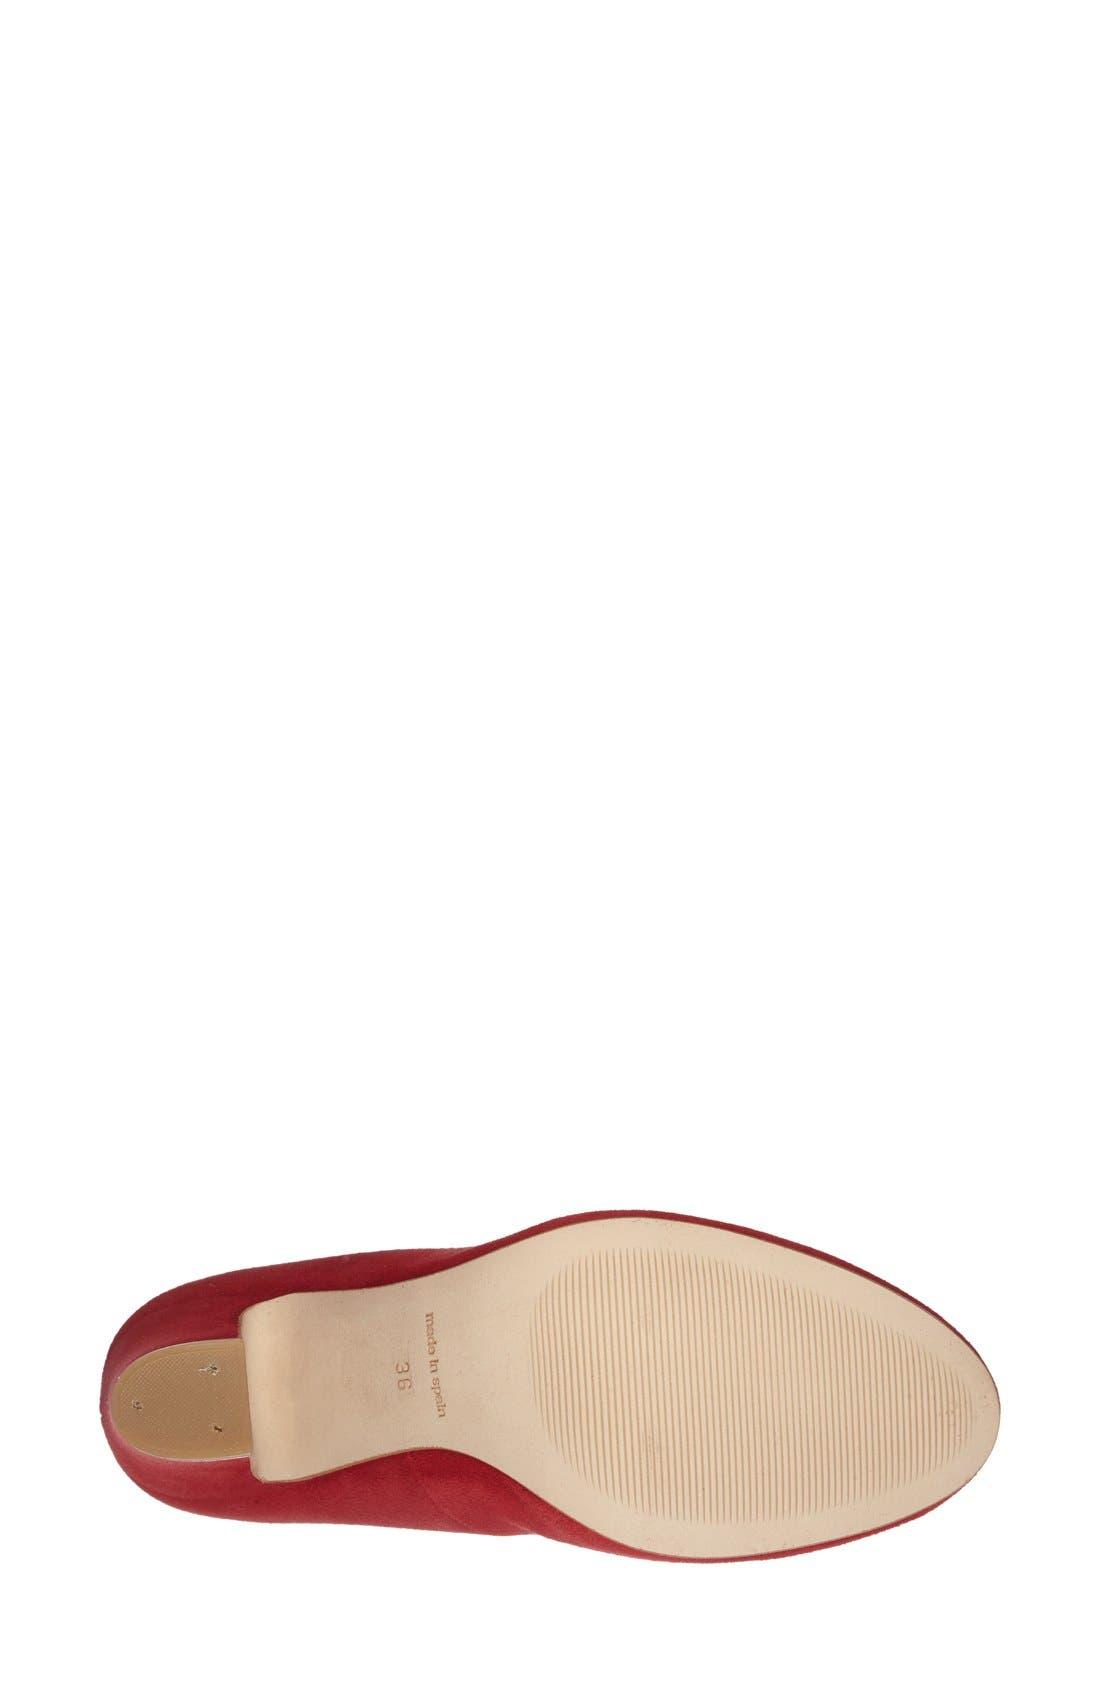 Alternate Image 4  - Dune London 'Aubree' Block Heel Pump (Women)